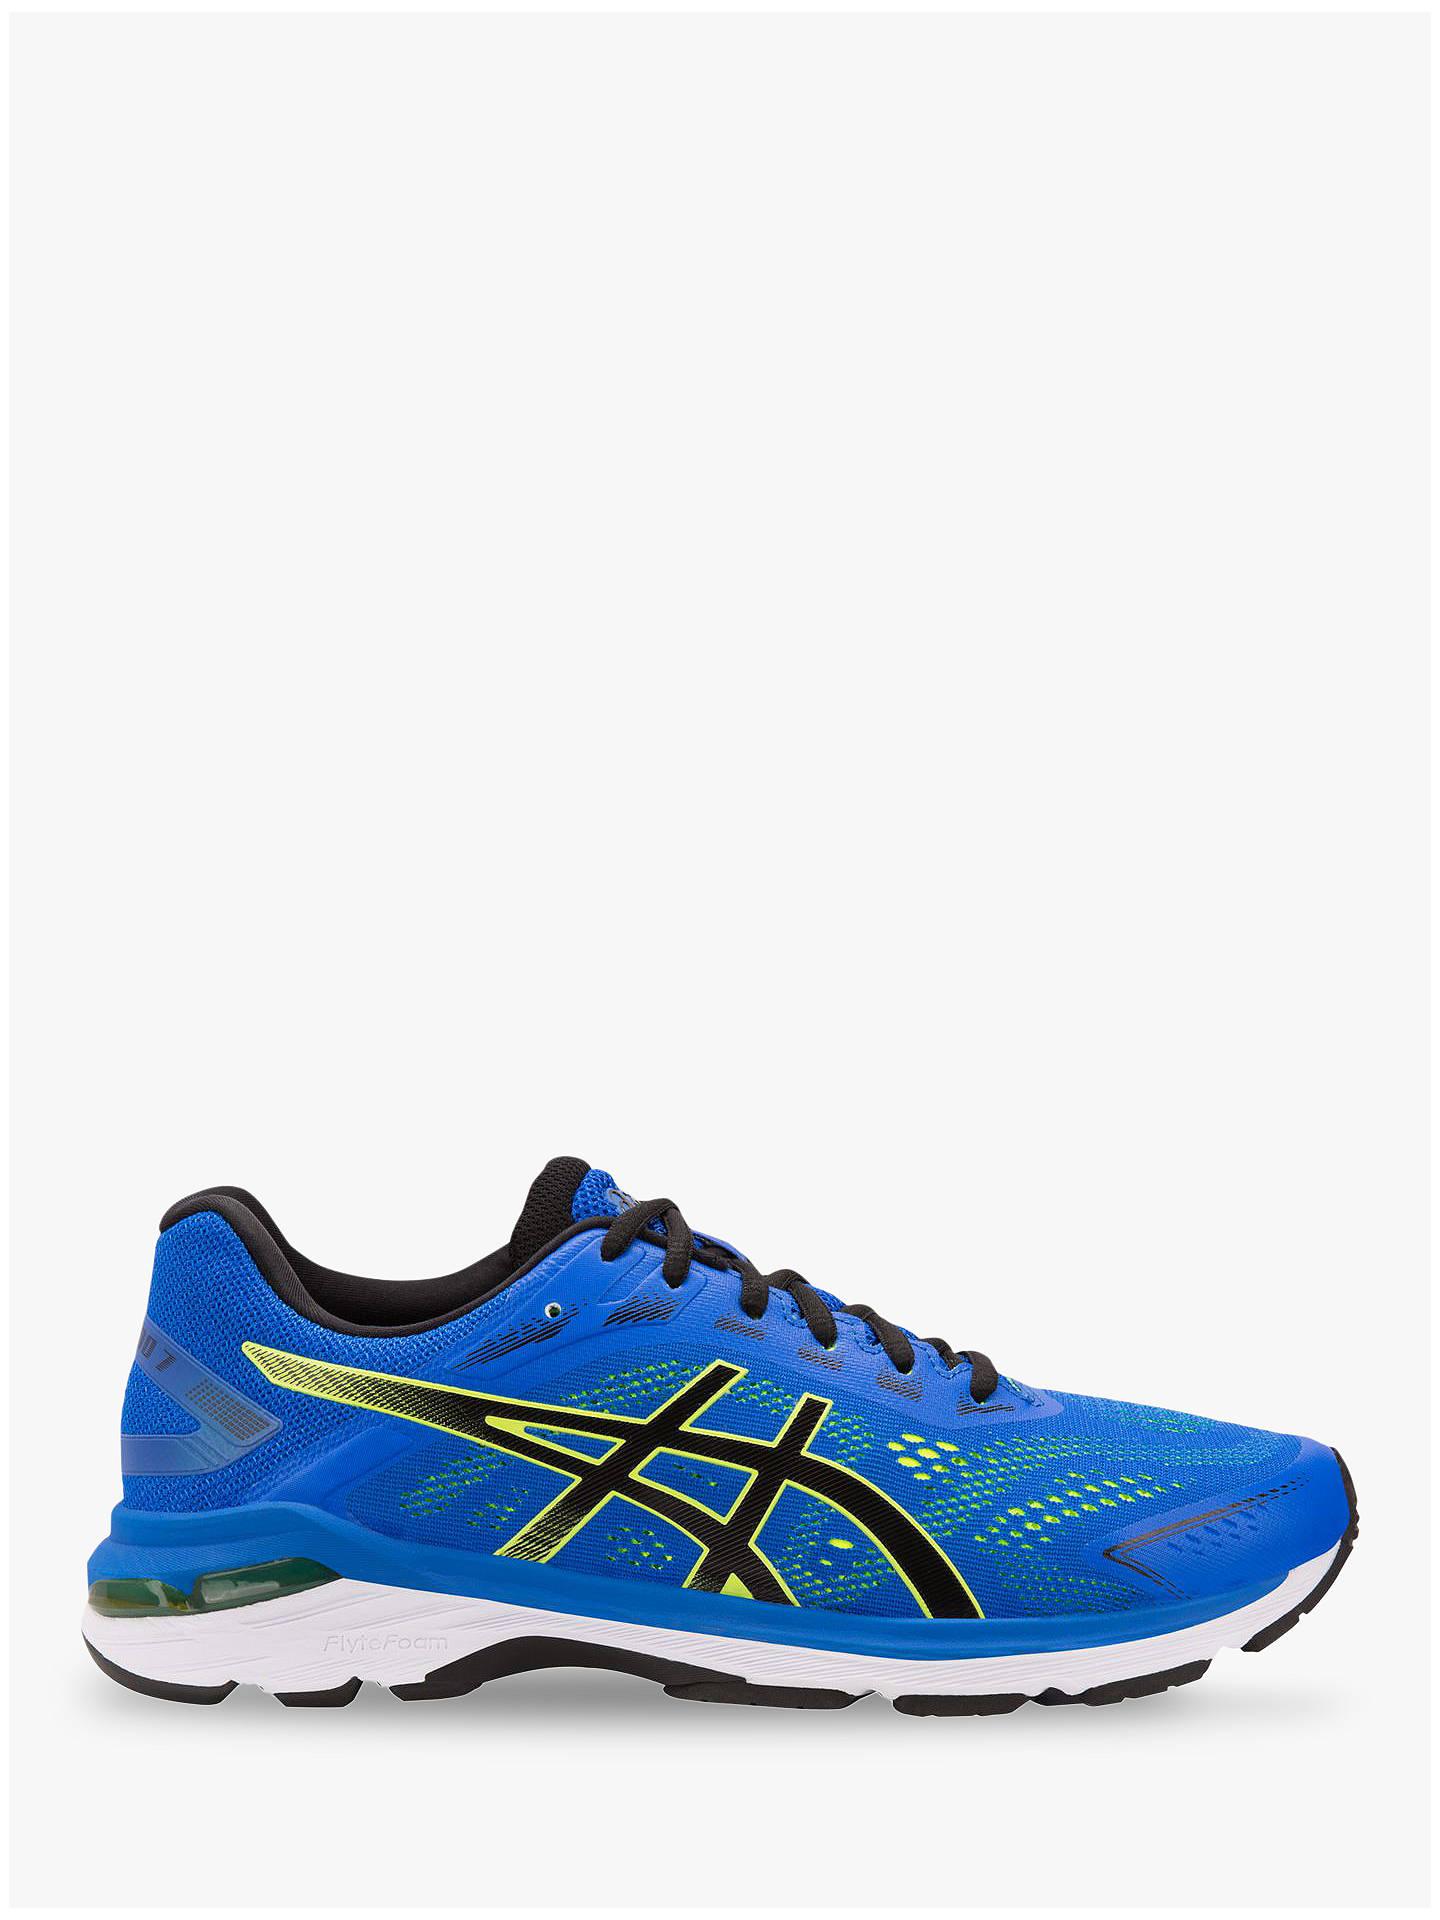 436822779b Buy ASICS GT-2000 7 Men's Running Shoes, Illusion Blue/Black, 7 ...